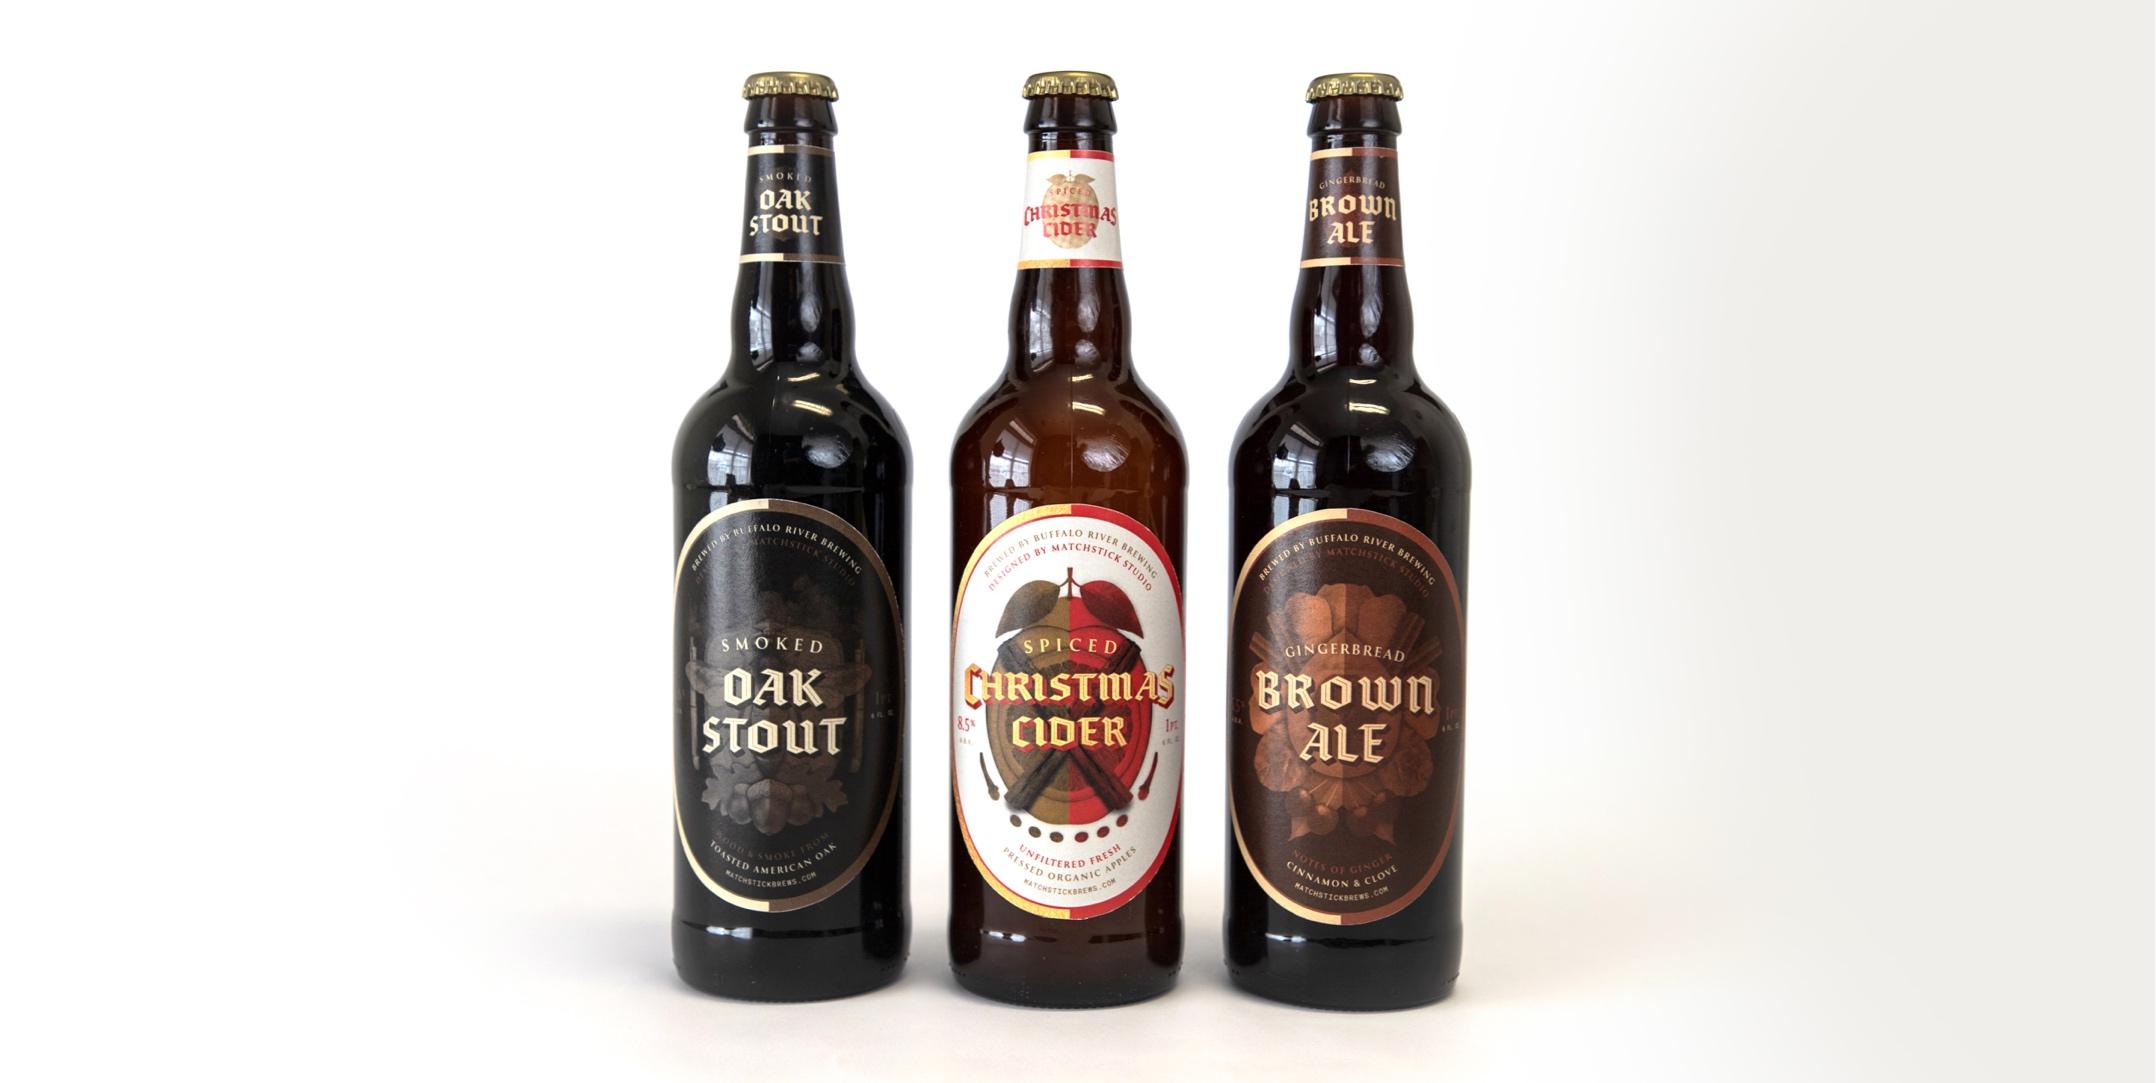 matchstick brews bottles and labels